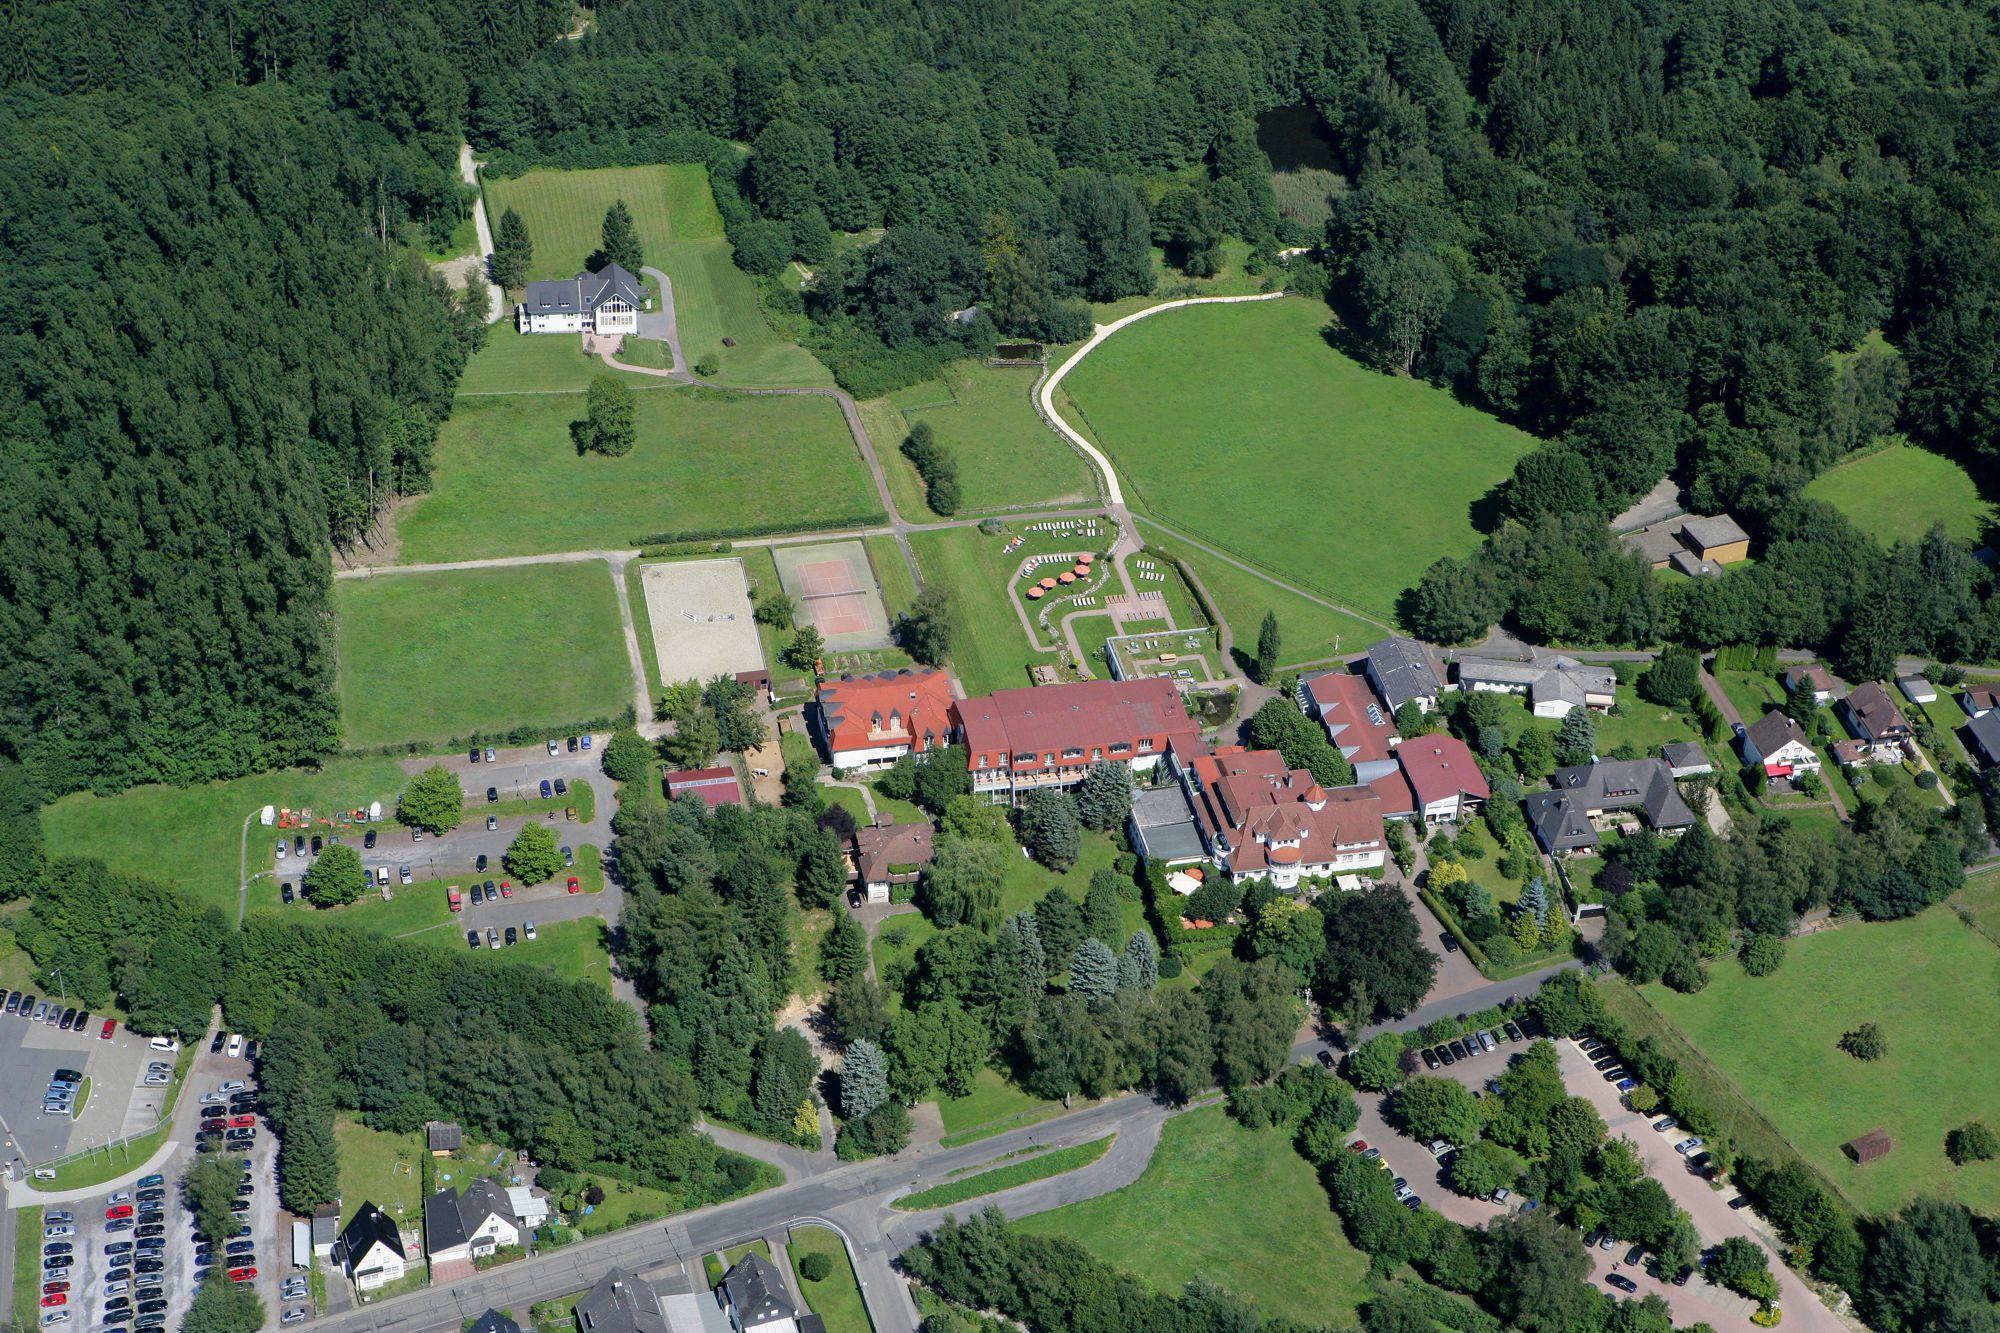 Urlaub In Rheinland Pfalz Corona